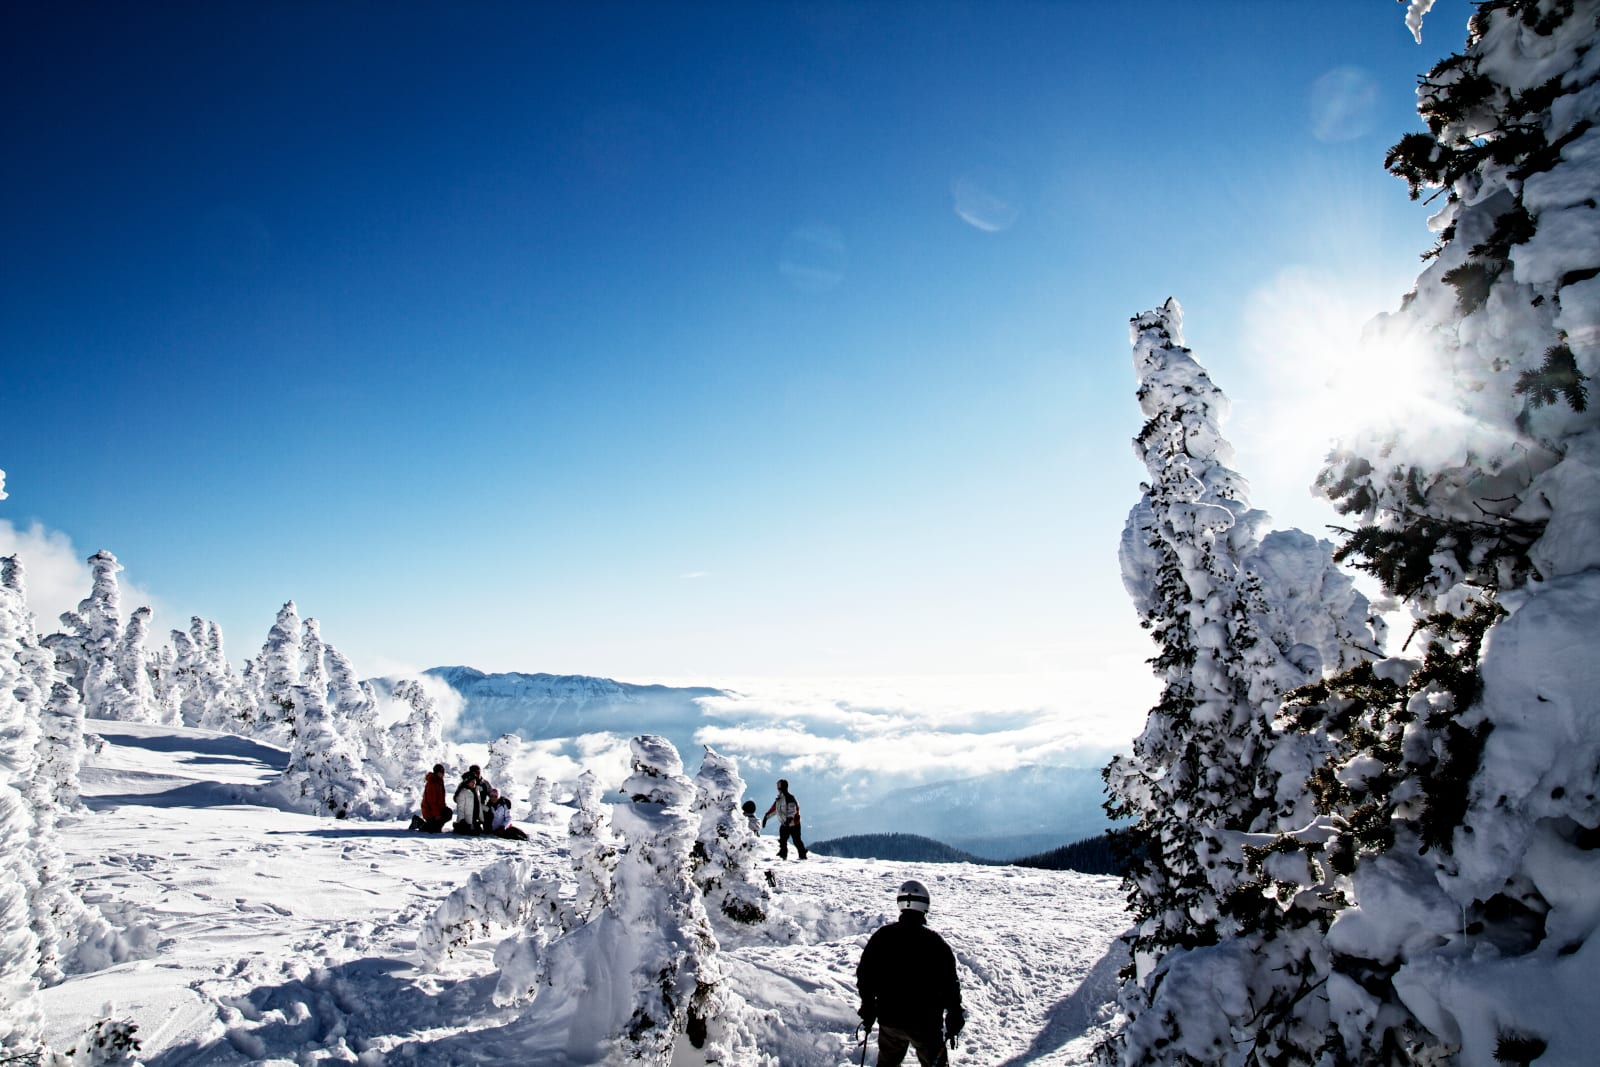 Winter Blues Wolf Creek Ski Area Group View